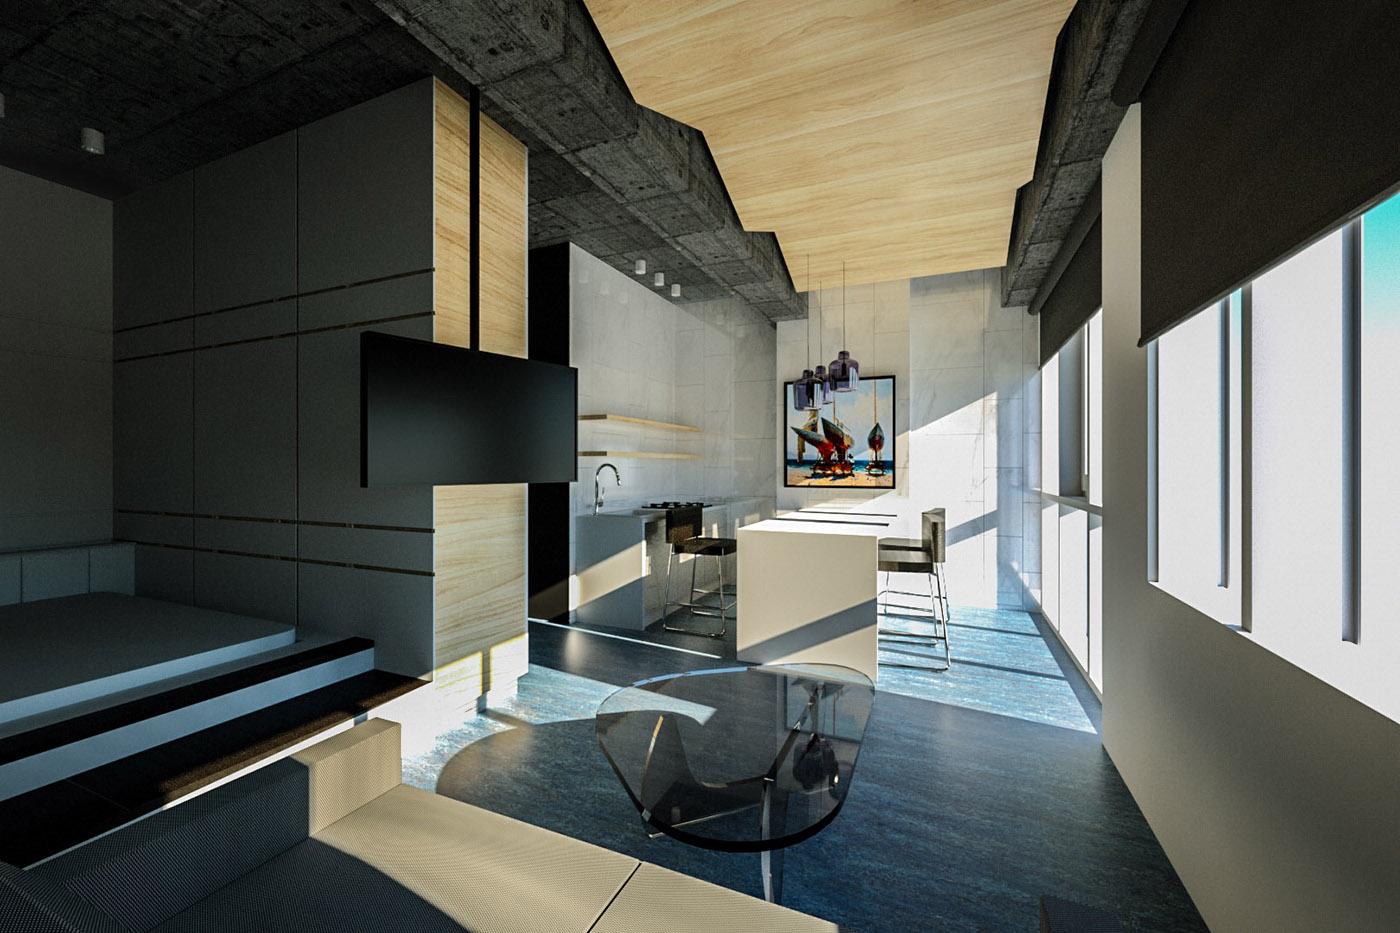 36 Sq M Apartment In Sochi On Behance